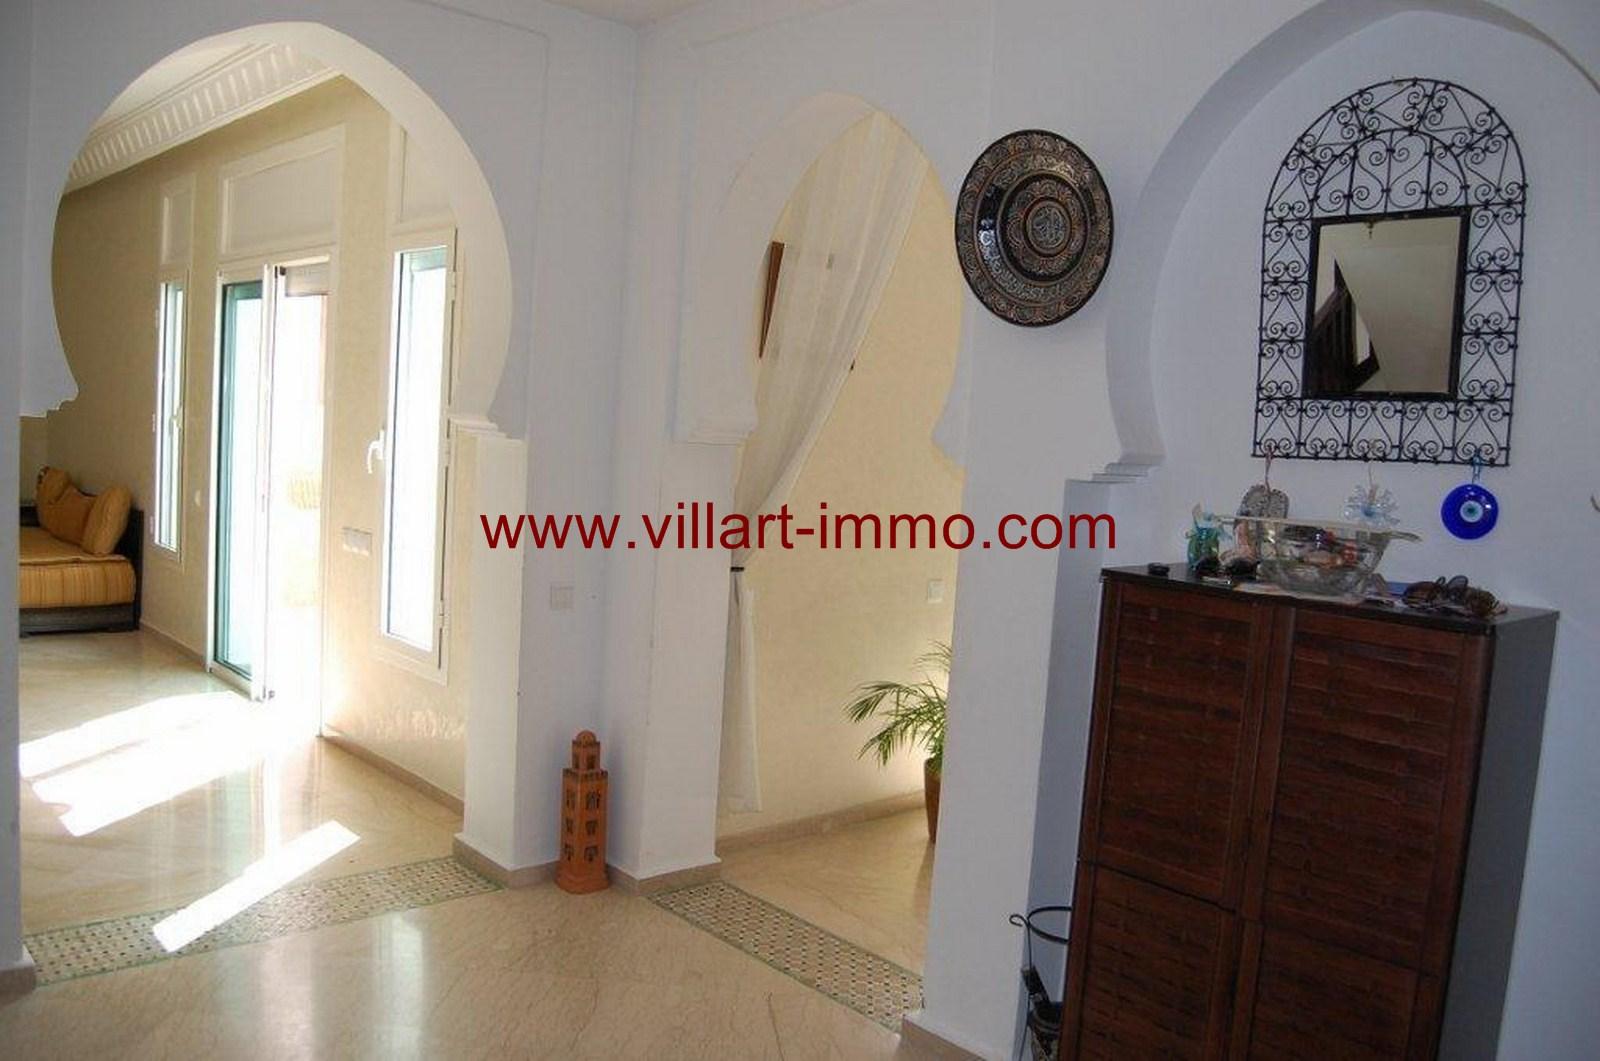 10-For-Sale-Villa-Tangier-Malabata-Corridor-VV354-Villart Immo